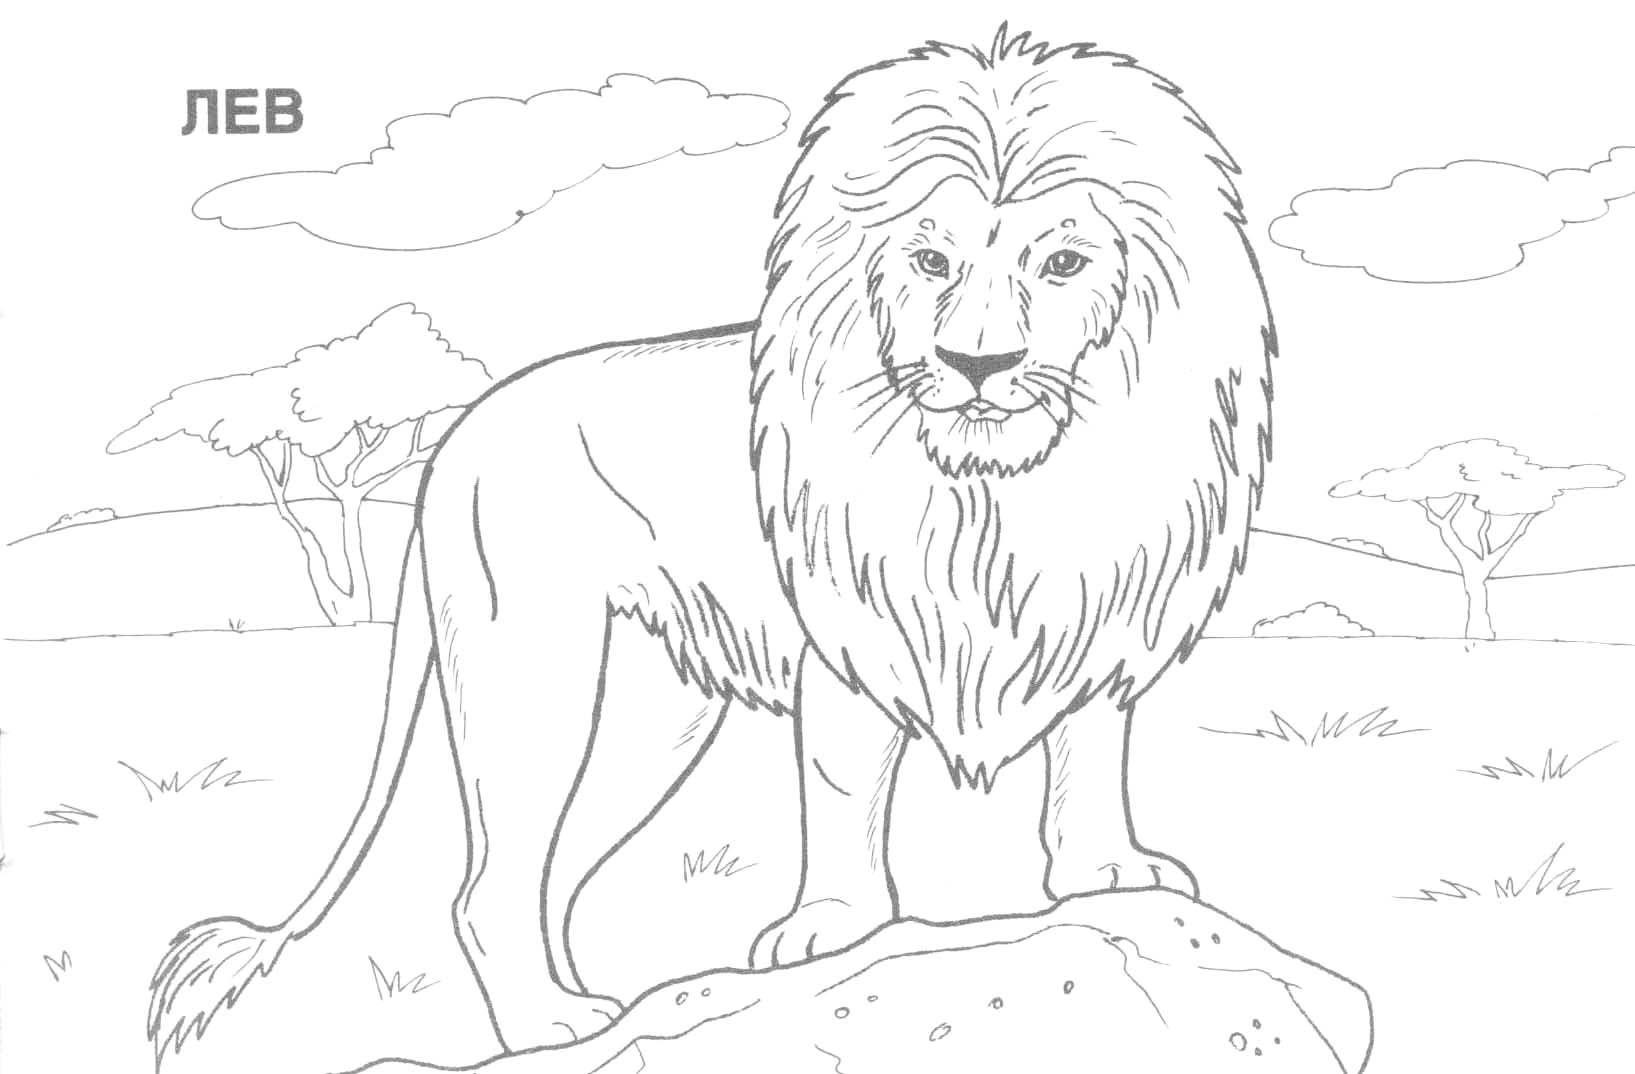 Pinjulia On Colorings   Blanco Y Negro, Dibujos A Lápiz - Free Printable Wild Animal Coloring Pages